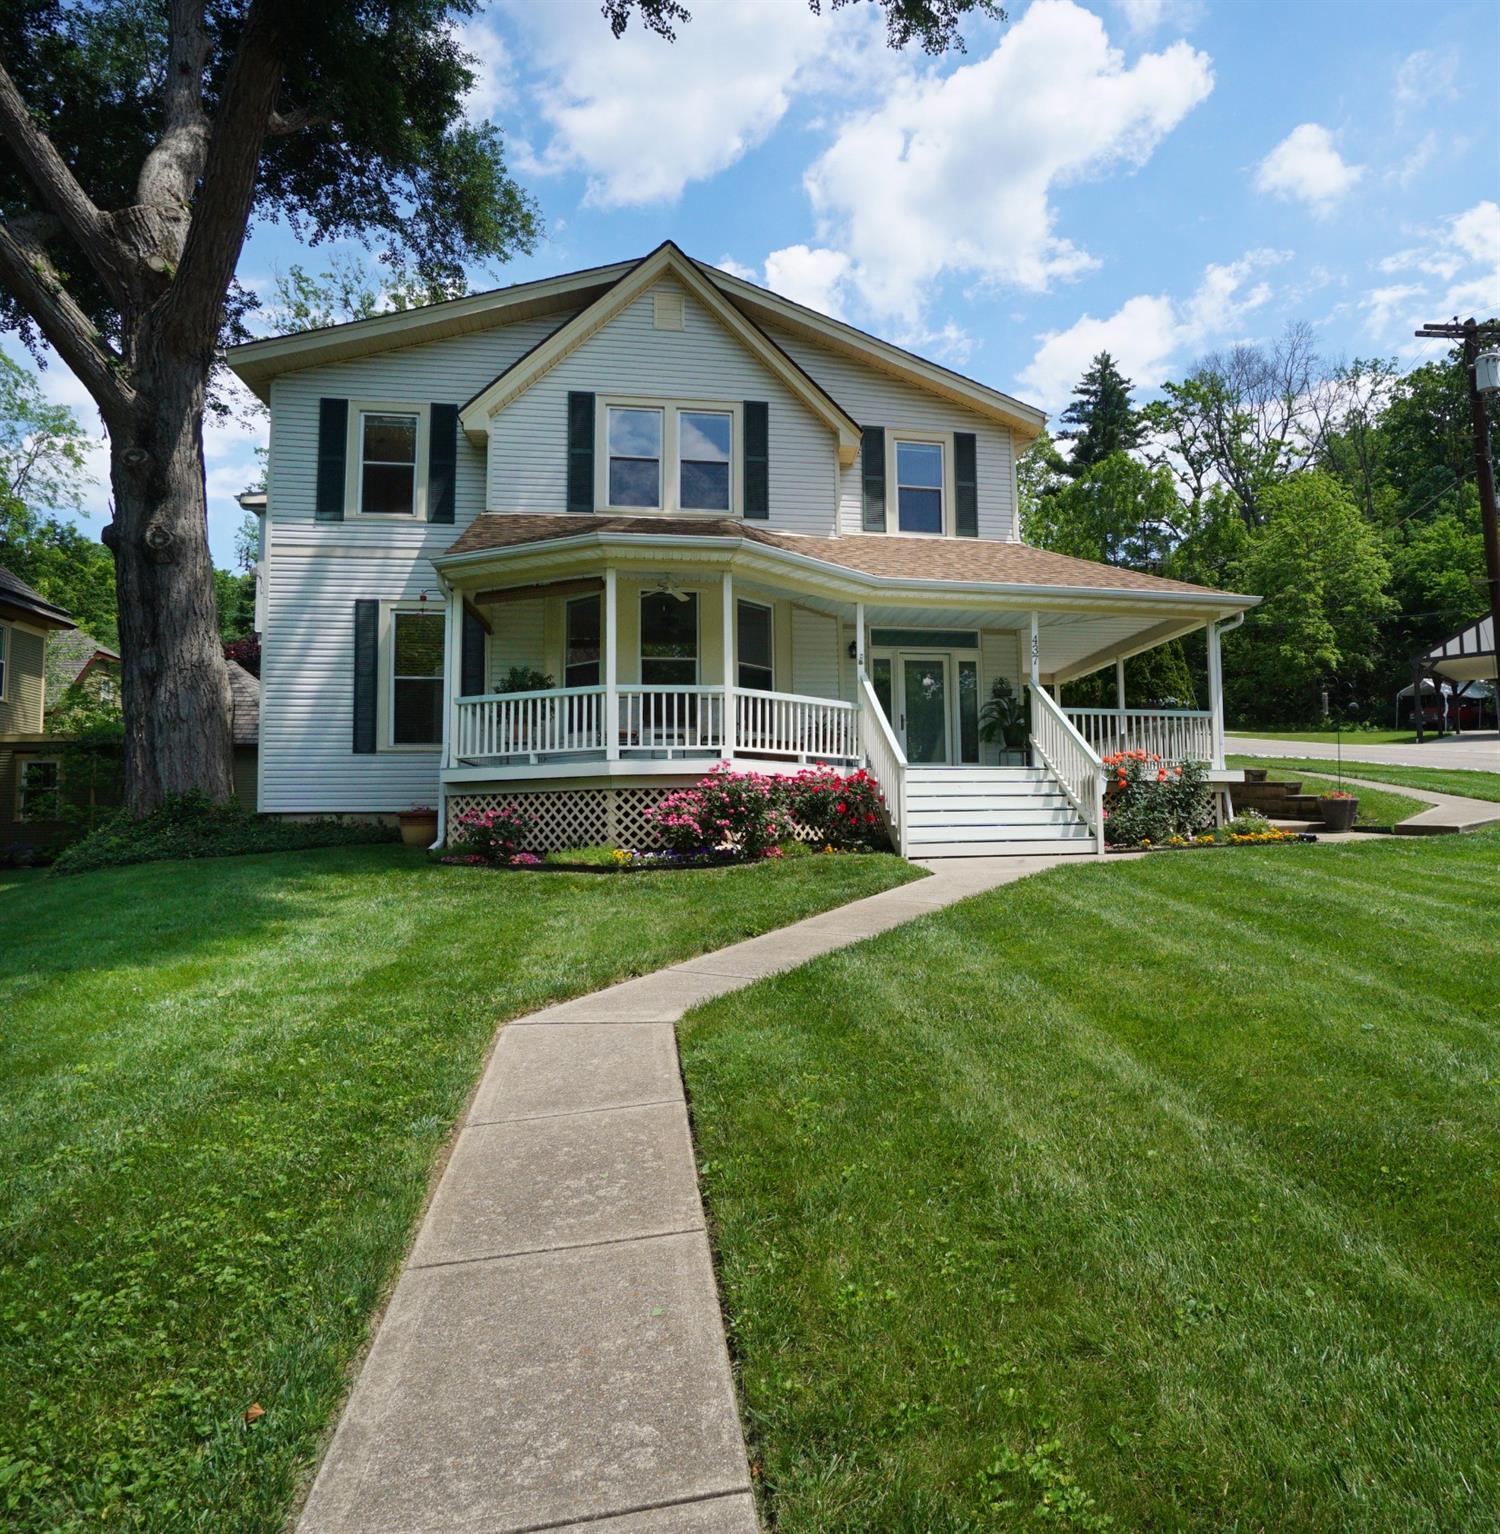 437 Garfield Avenue, Milford, OH 45150